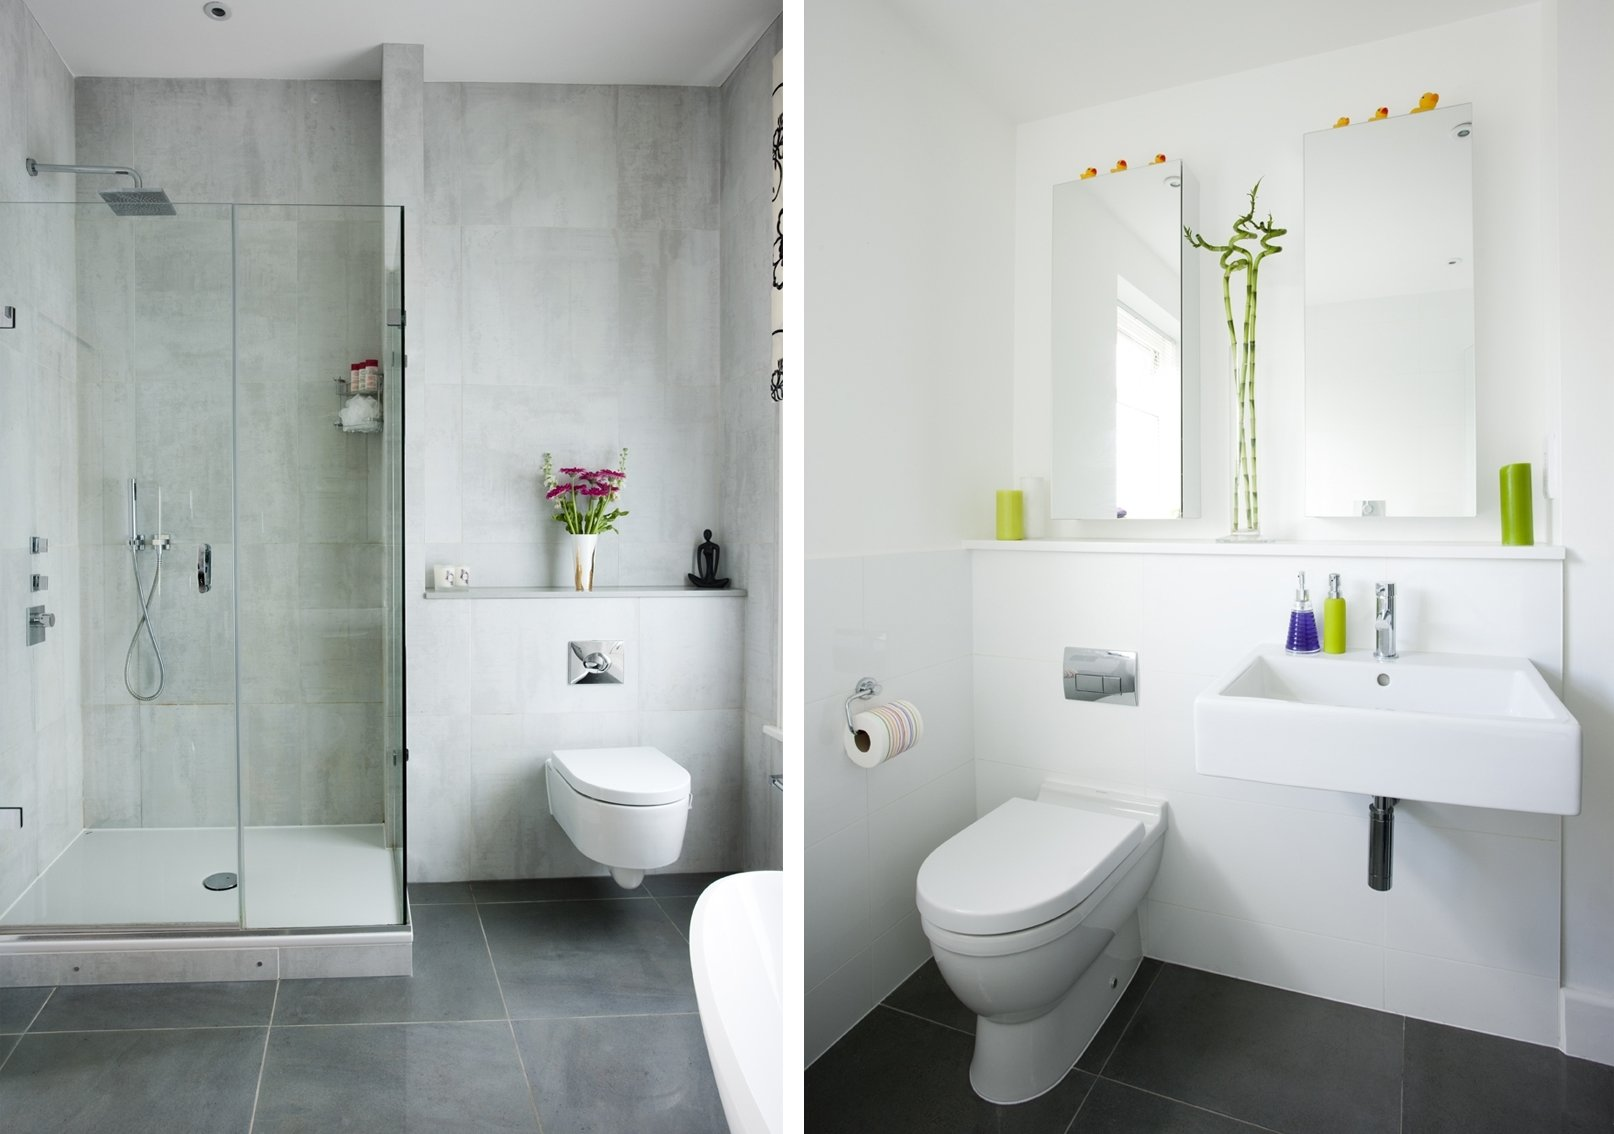 10 Elegant Grey And White Bathroom Ideas bathroom posh grey bathroom ideas with tiles furniture and small 2020